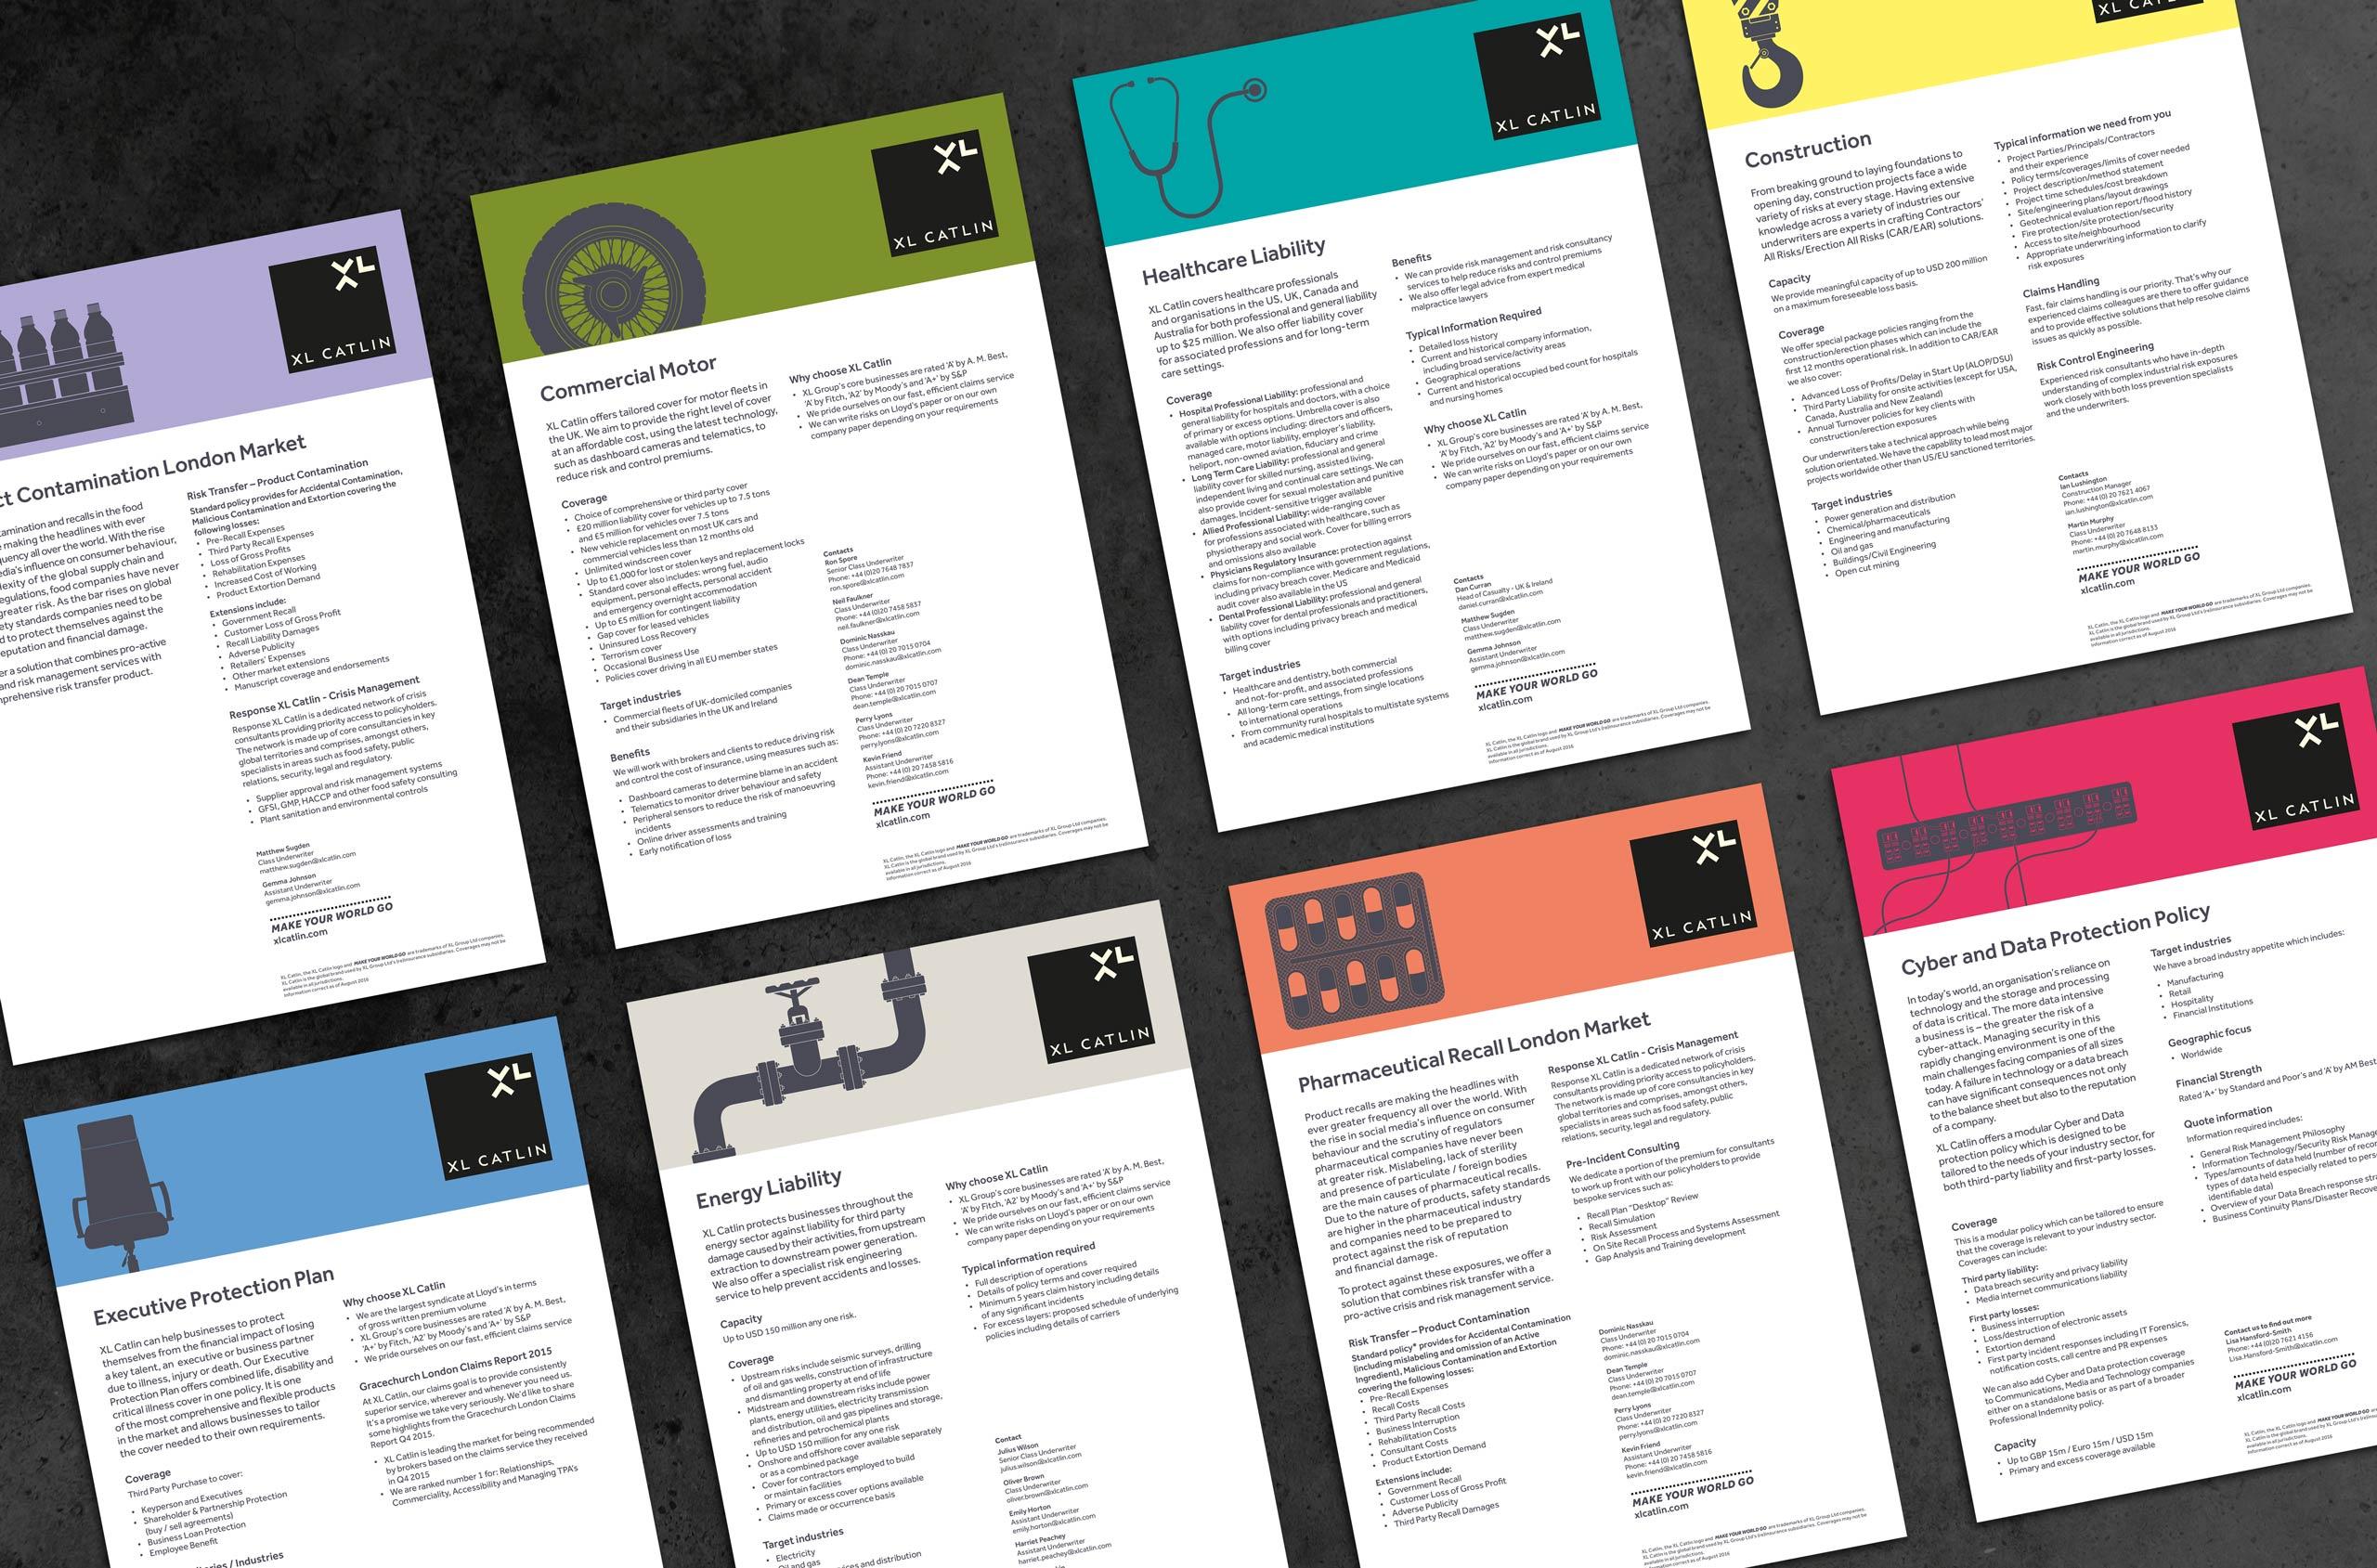 Glendale Creative XL Catlin Custom Illustrations Factsheets